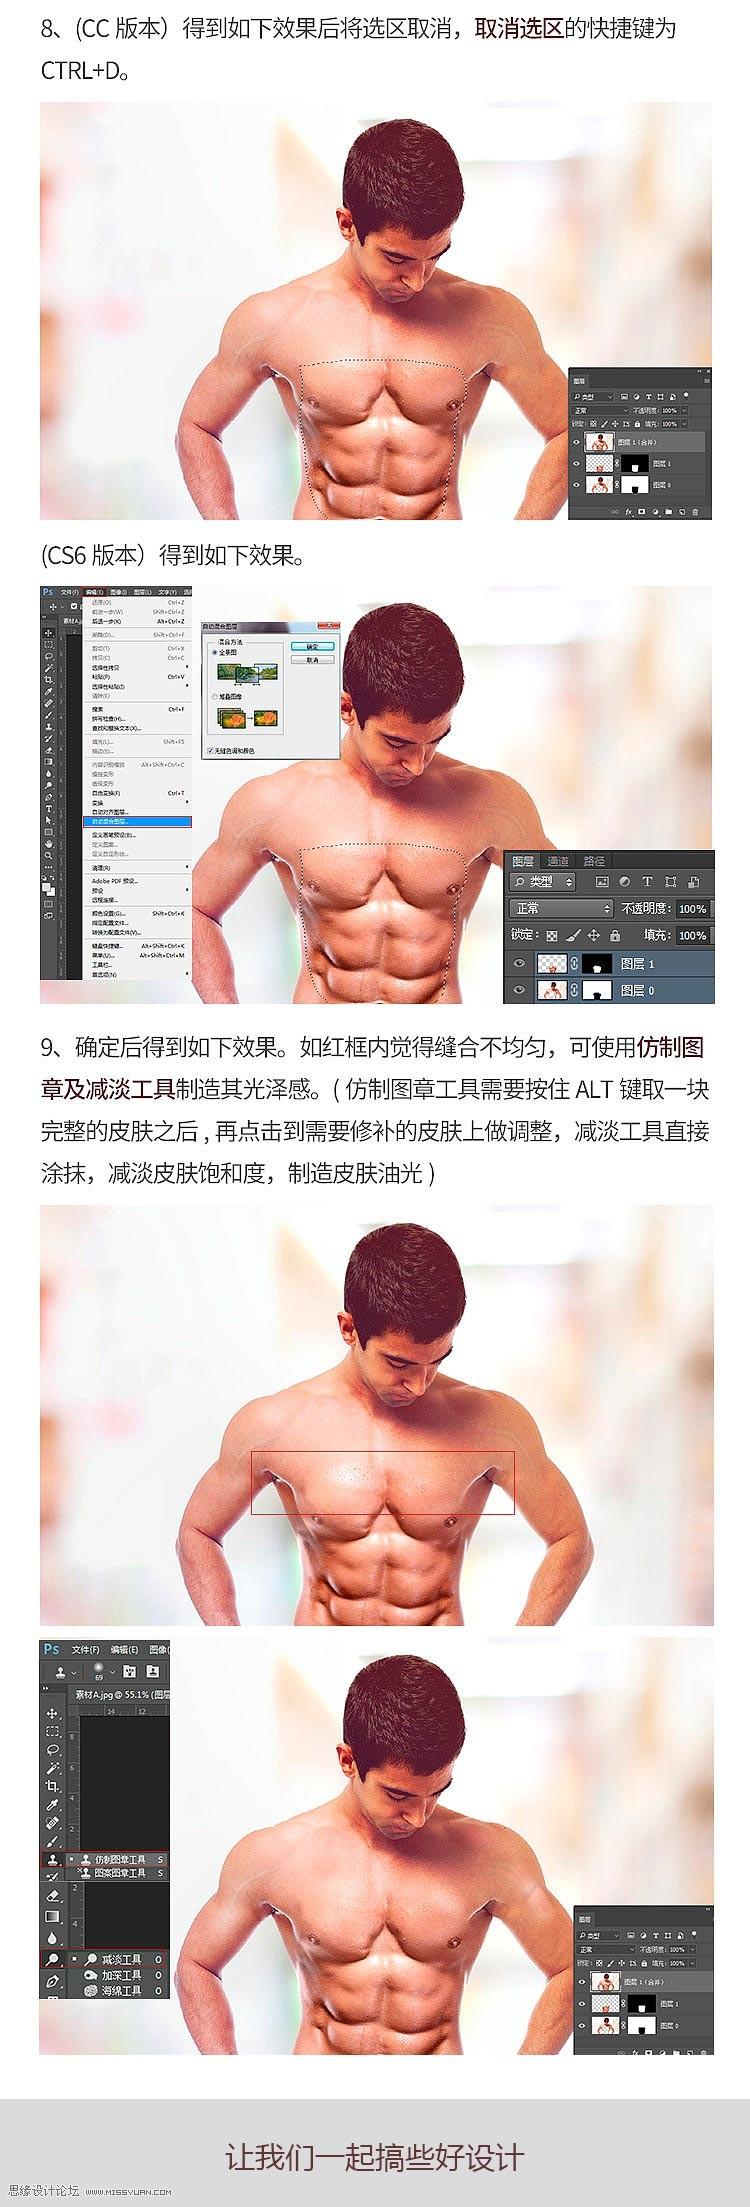 Photoshop給沒有腹肌的人像添加腹肌效果